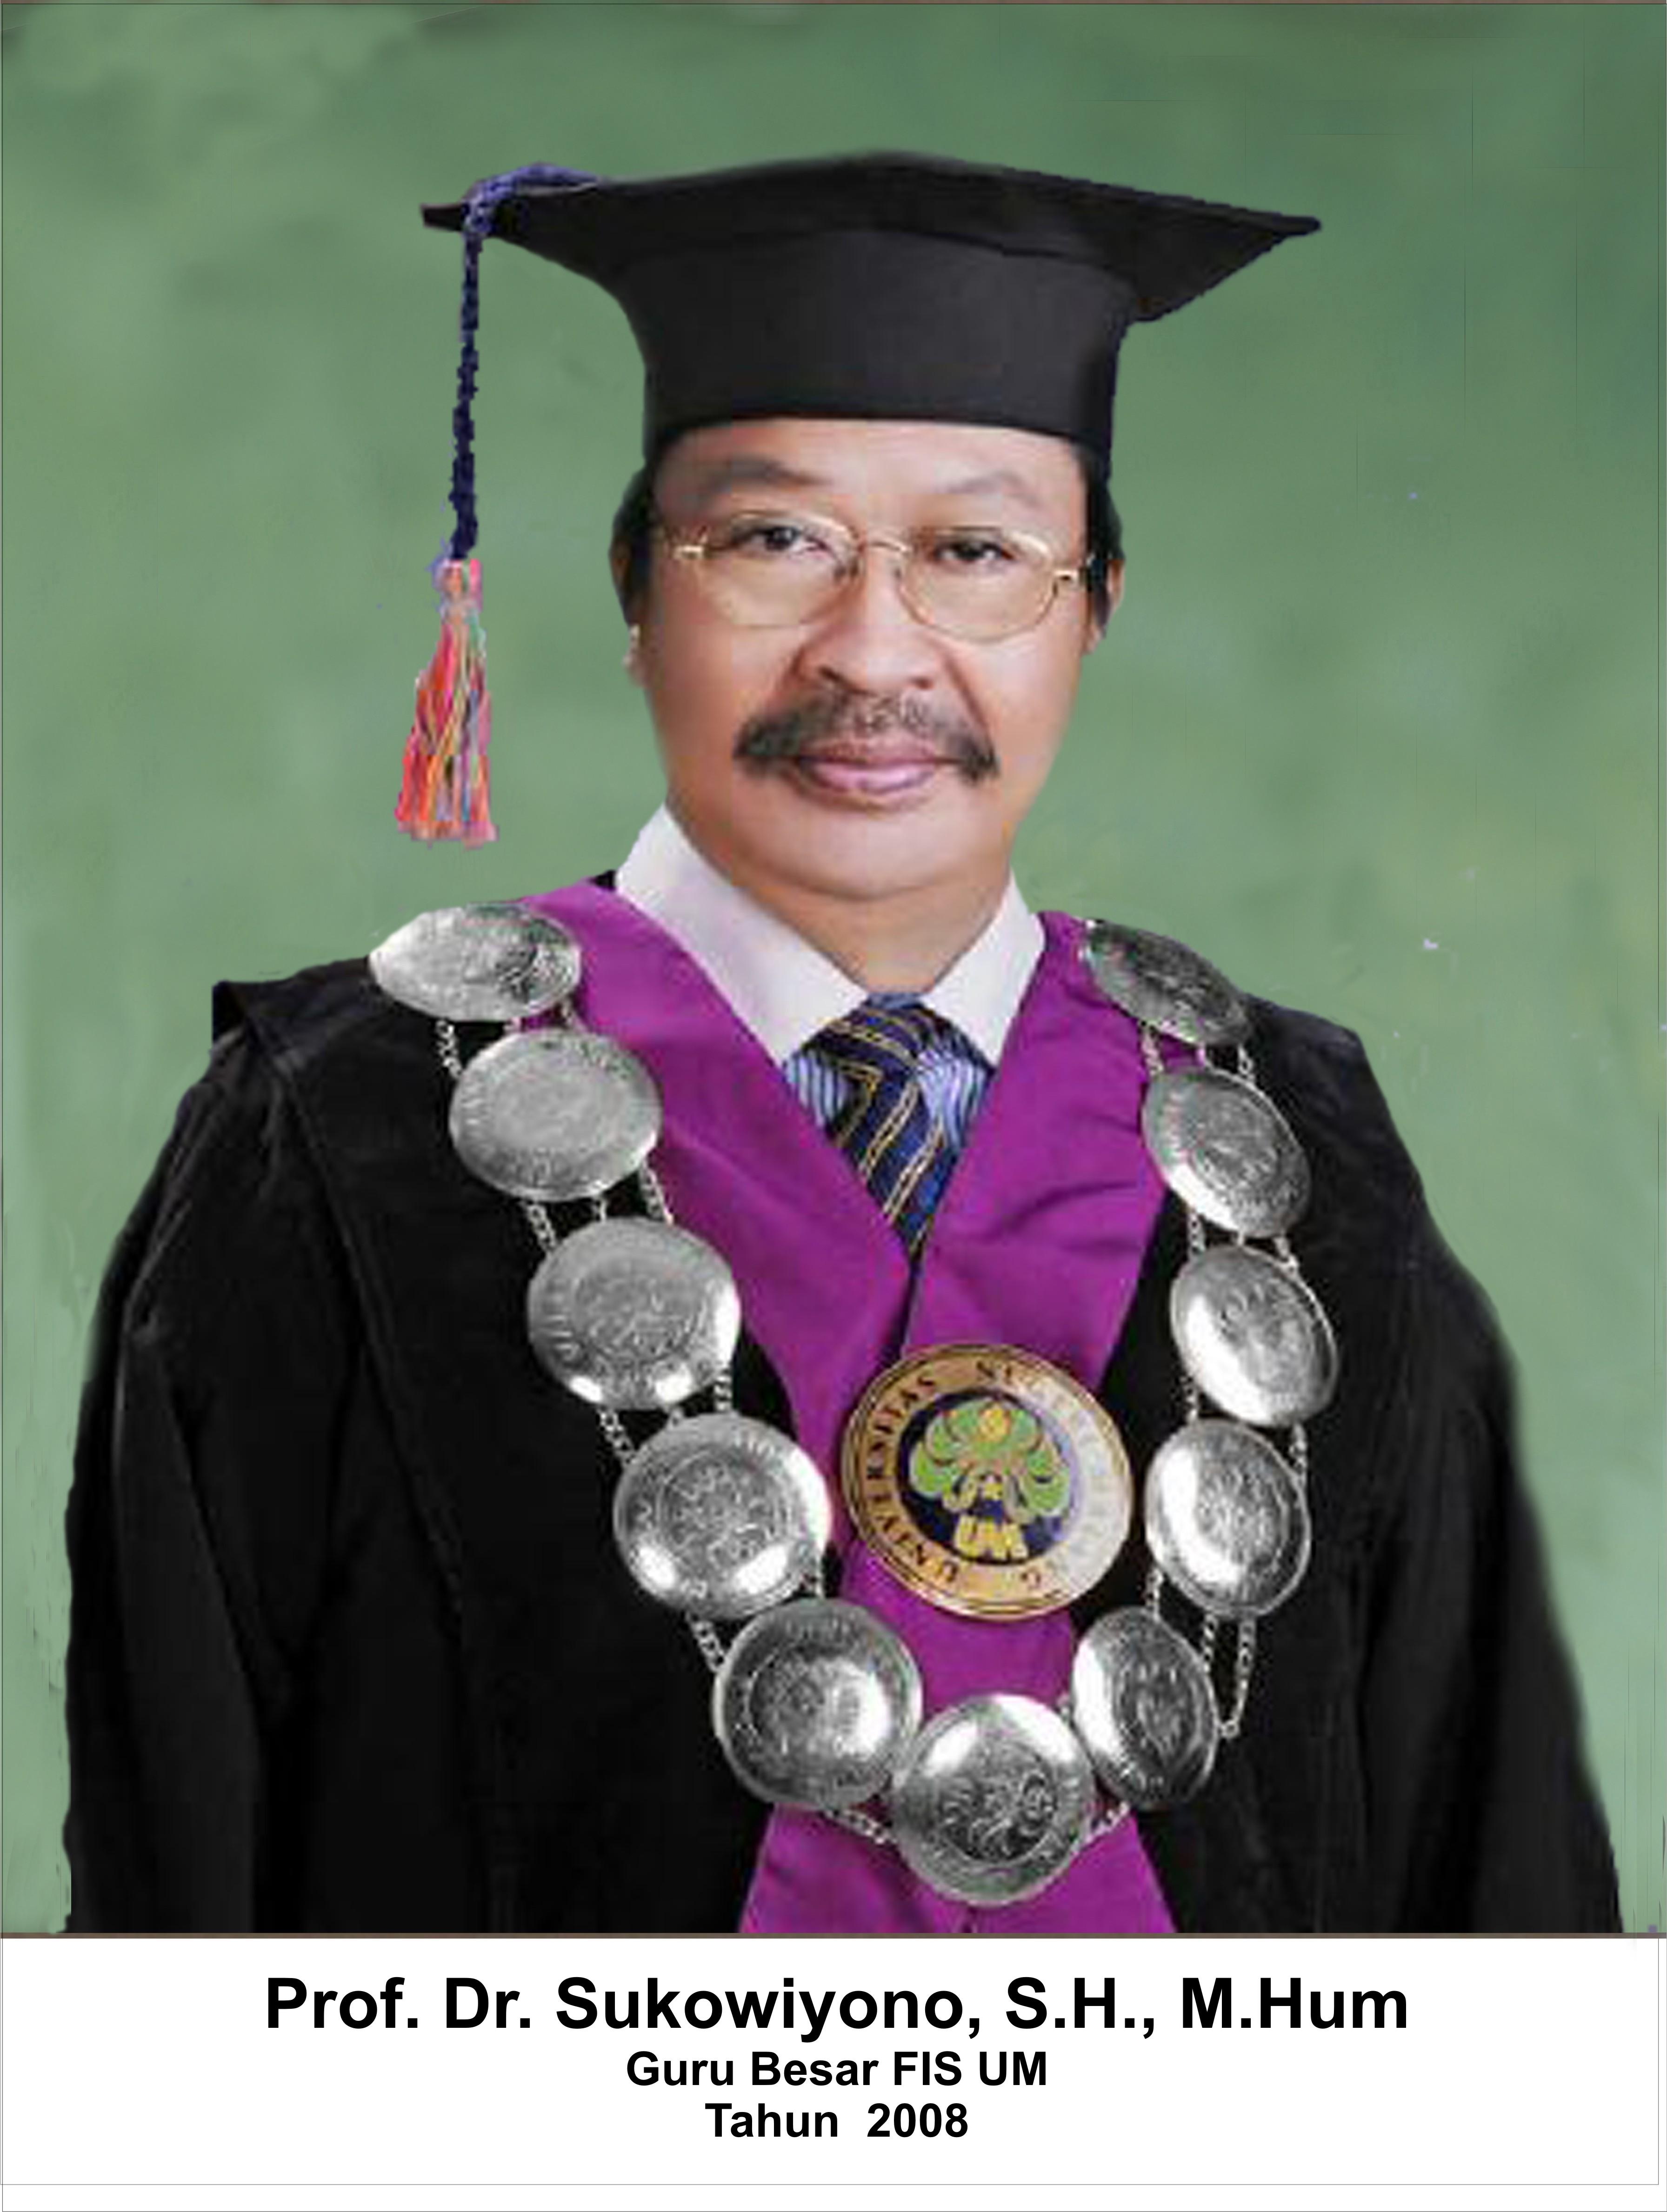 Prof. Dr. Suko Wiyono, S.H. M.Hum